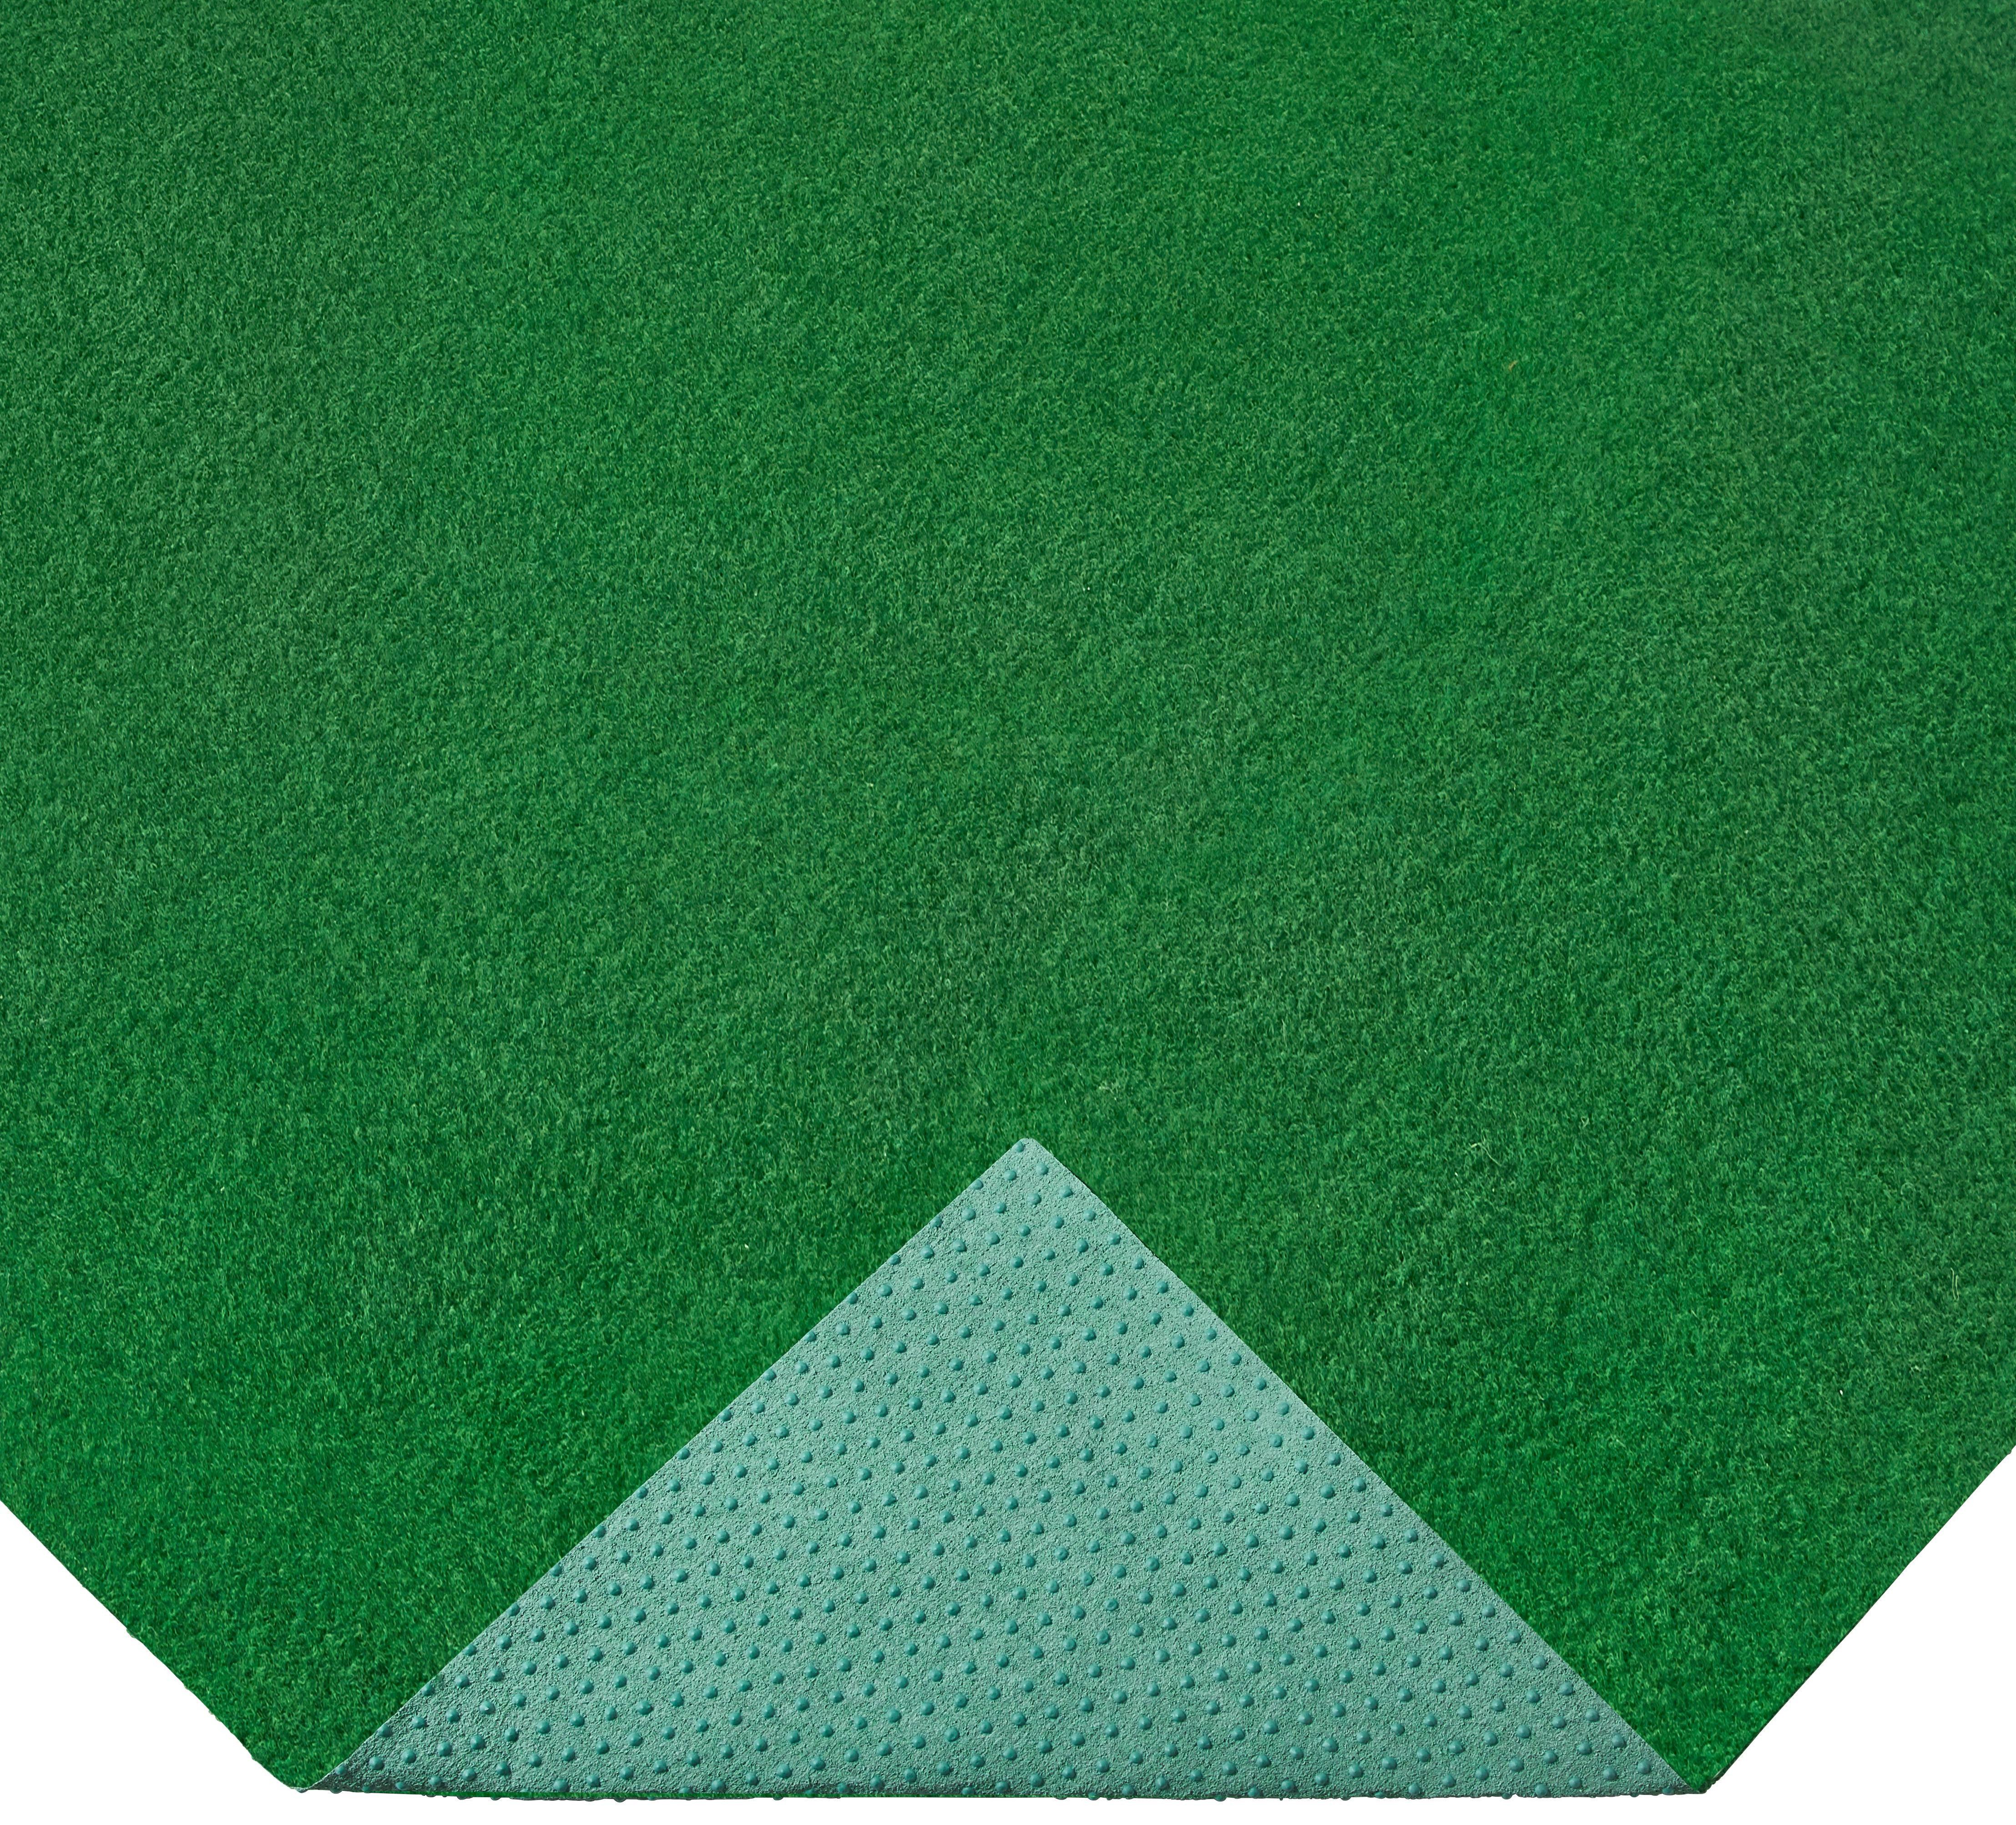 KONSTGRÄS - grön, Klassisk, textil (200/300cm) - Ambia Garden